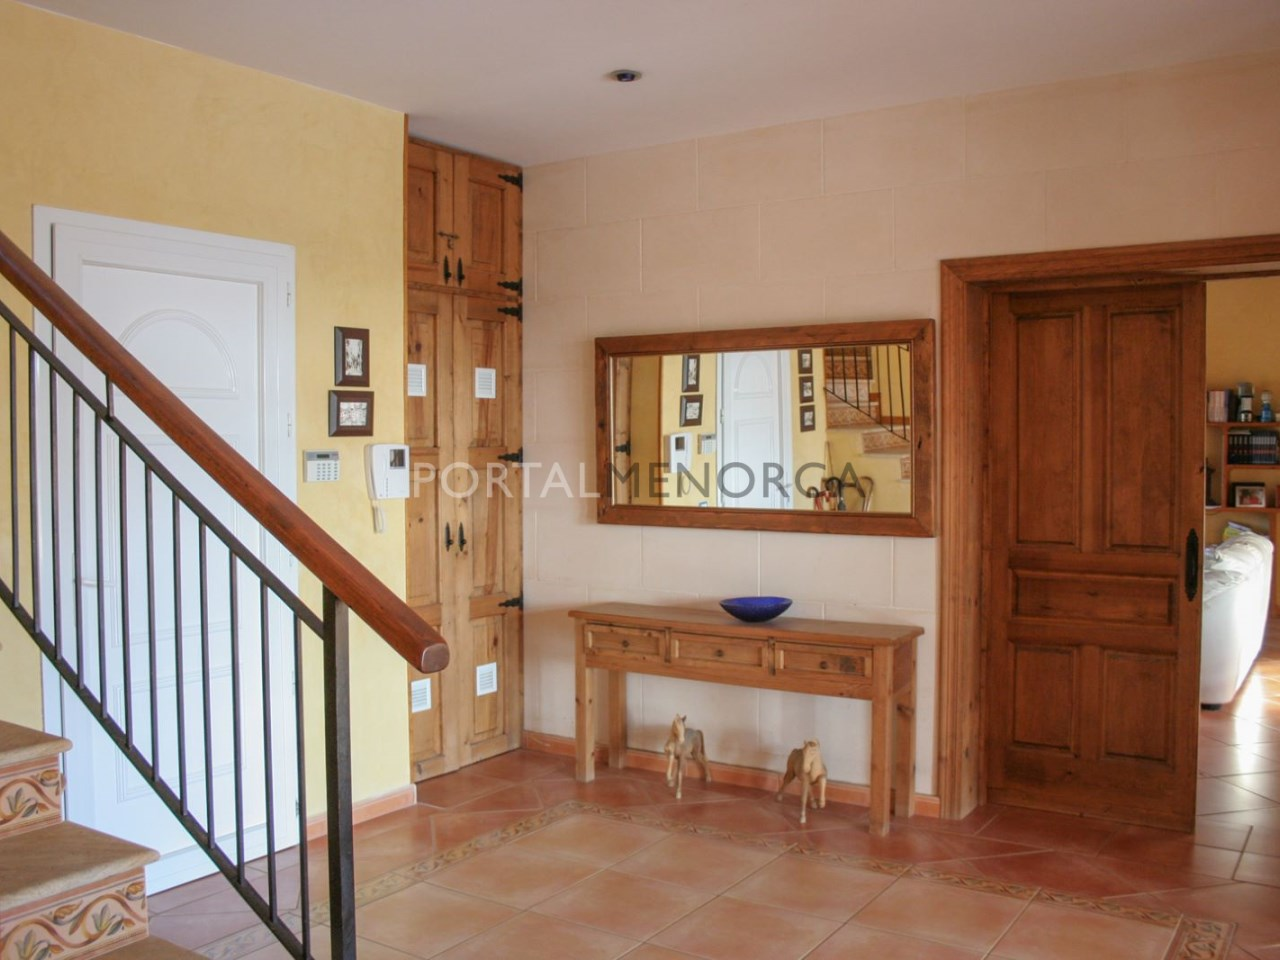 Casa de campo con piscina en Menorca (4 de 41)